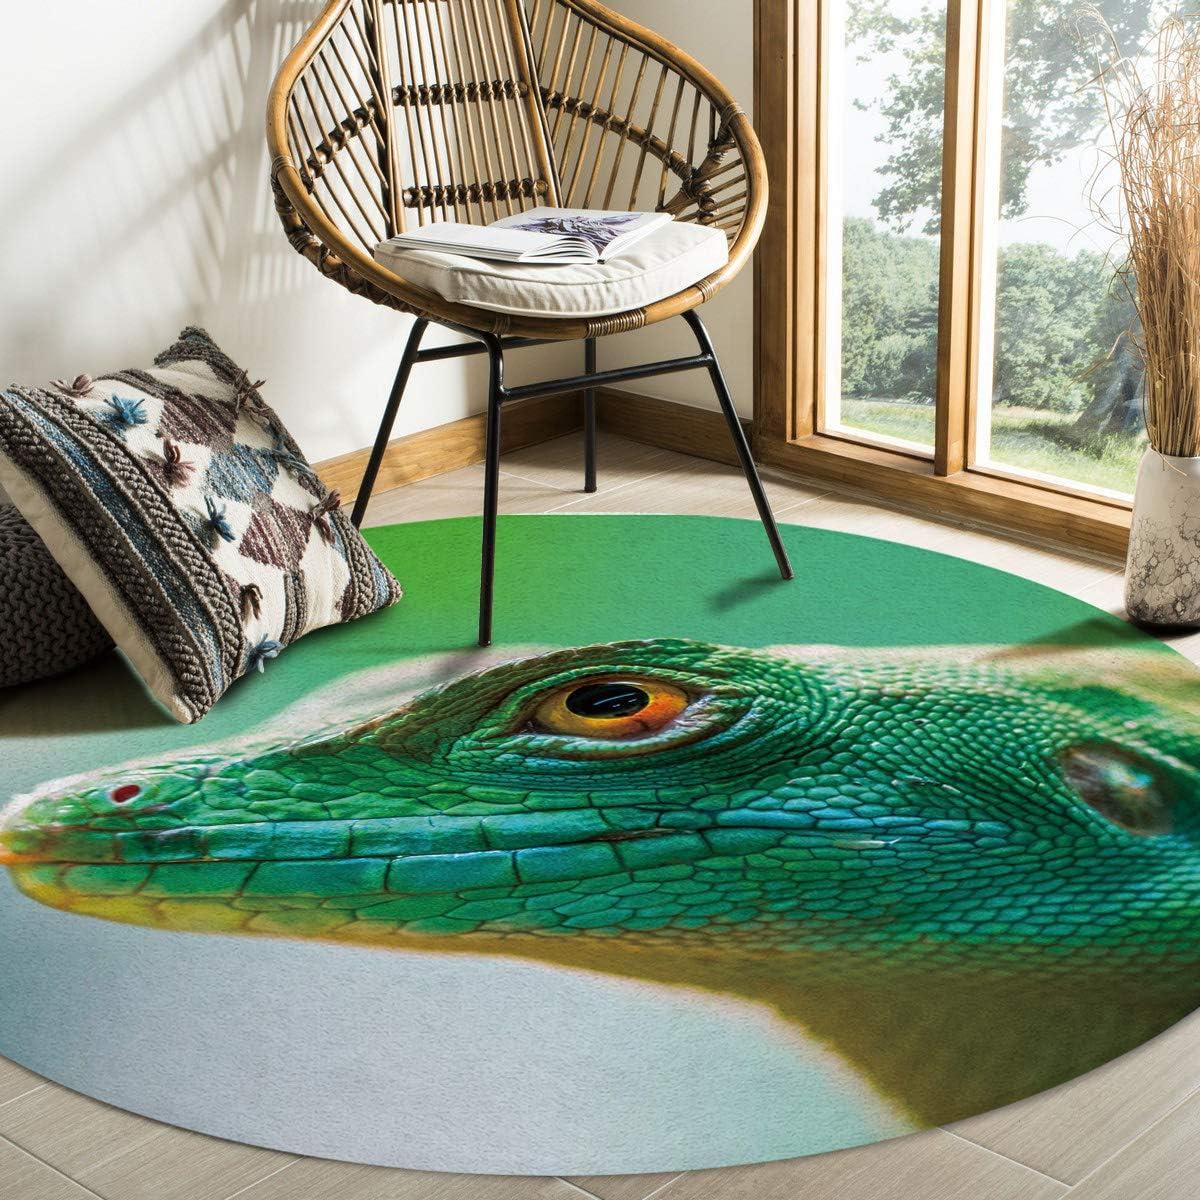 FAMILYDECOR Non-Shedding Plush Living Room Max 40% OFF Super Mat Our shop most popular Floor Soft